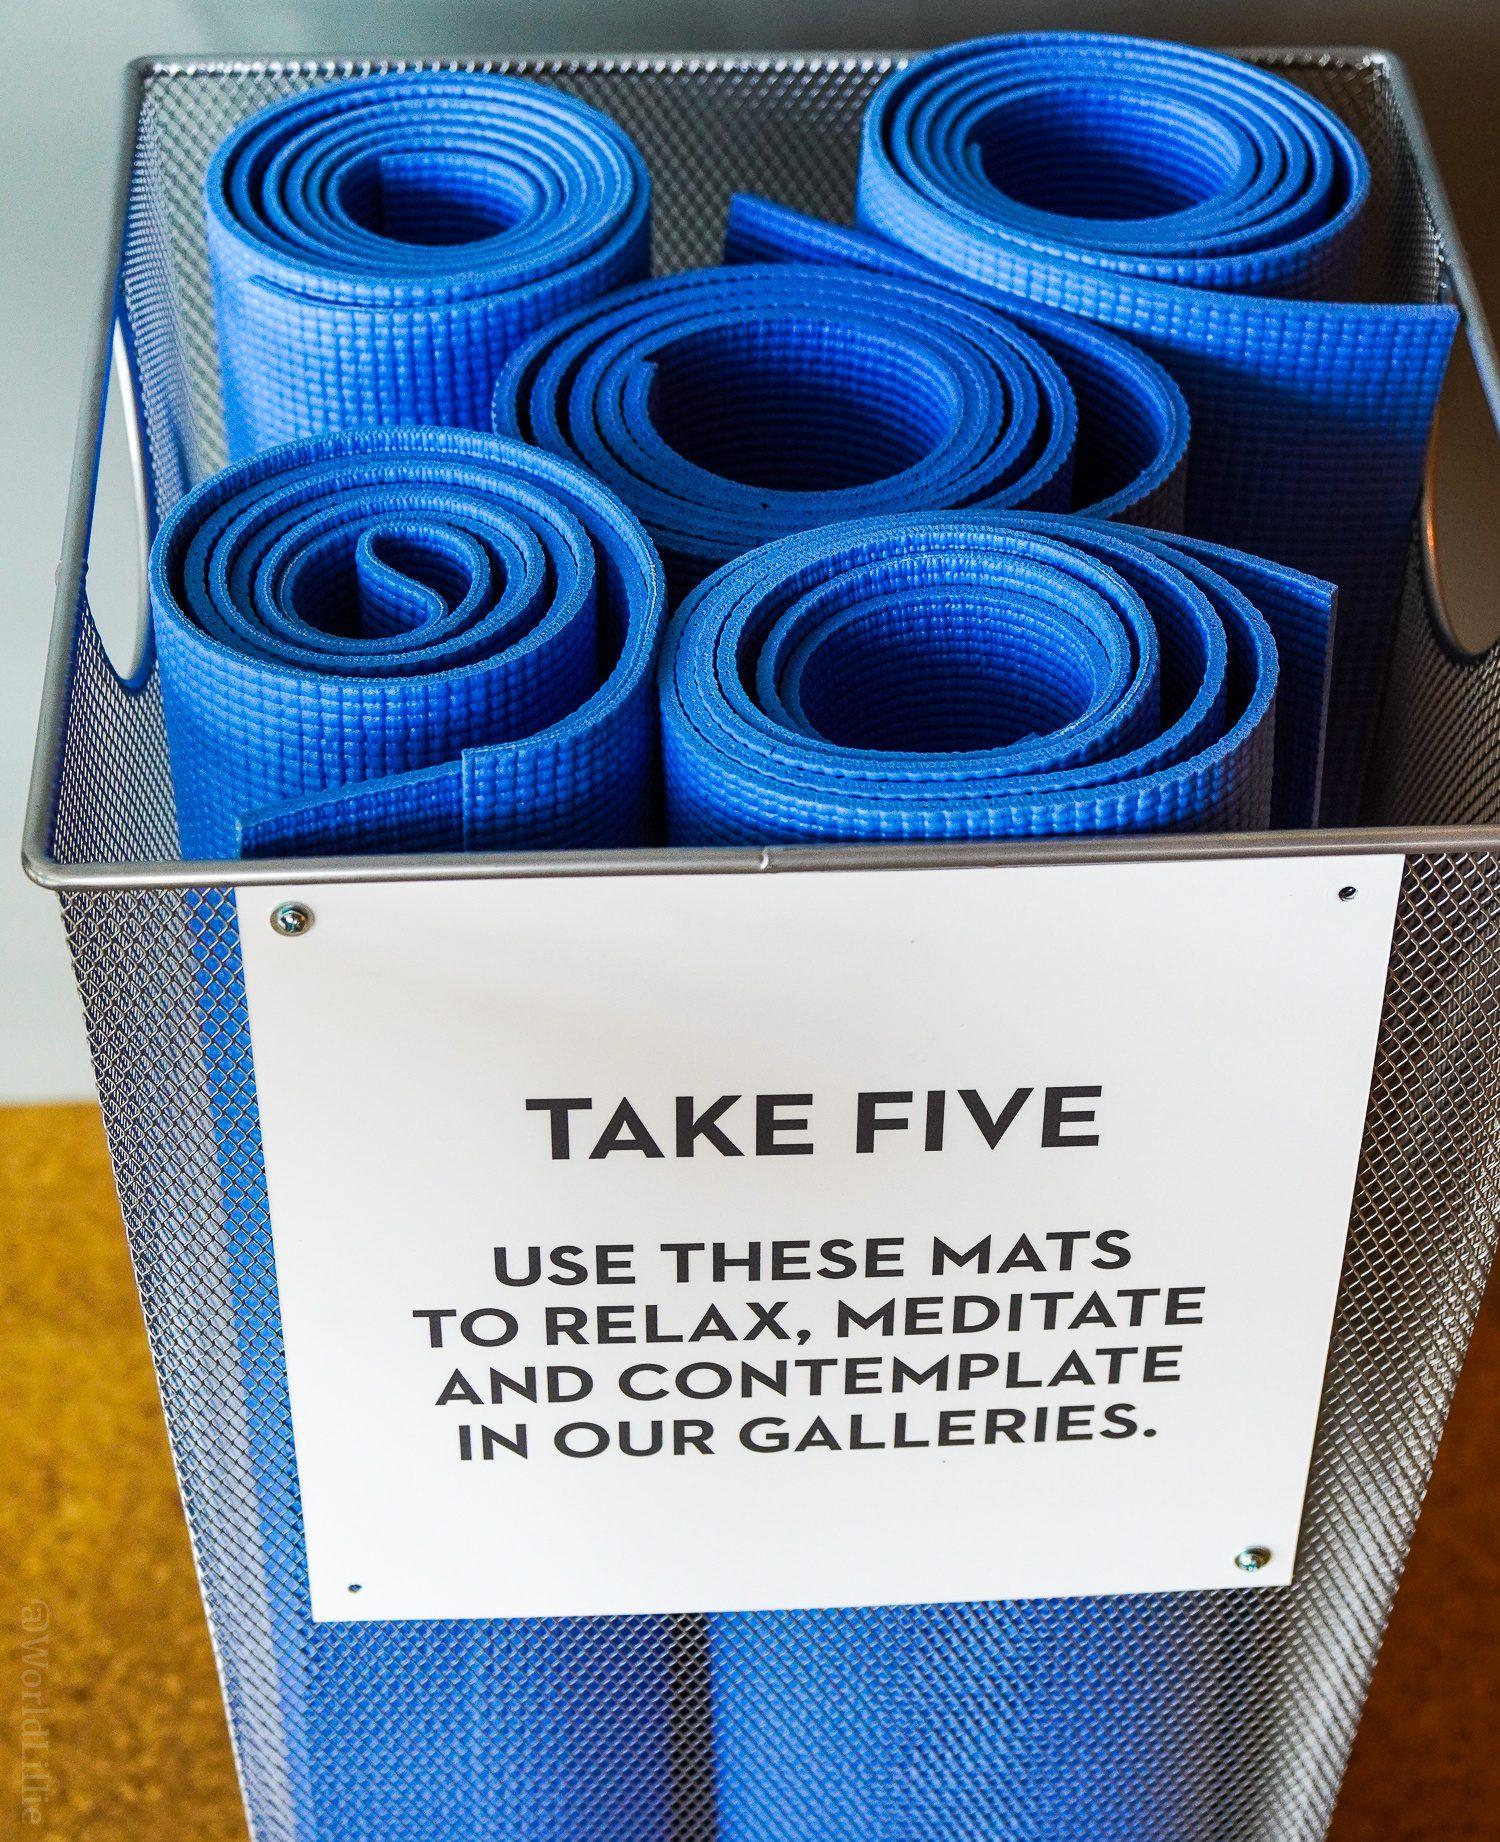 Yoga mats to relax in an art museum